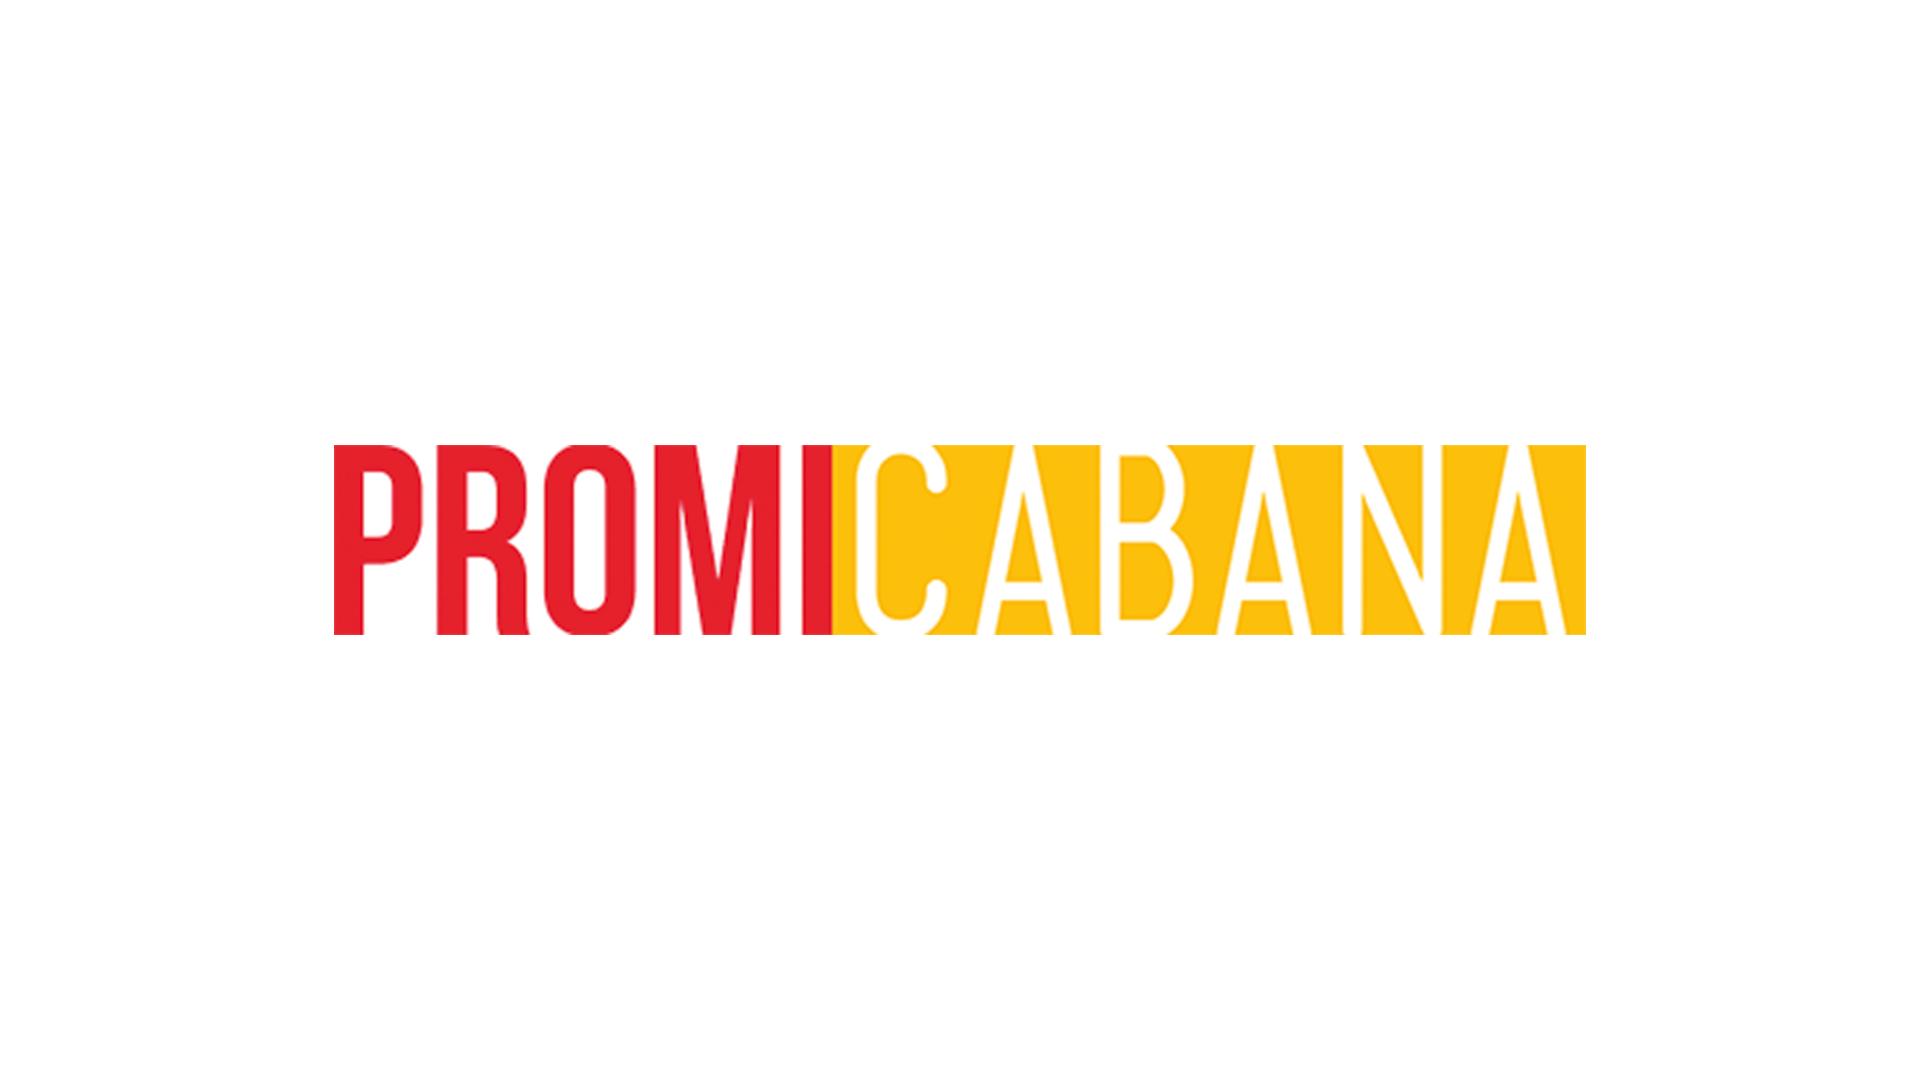 Jake-Gyllenhaal-Heath-Ledger